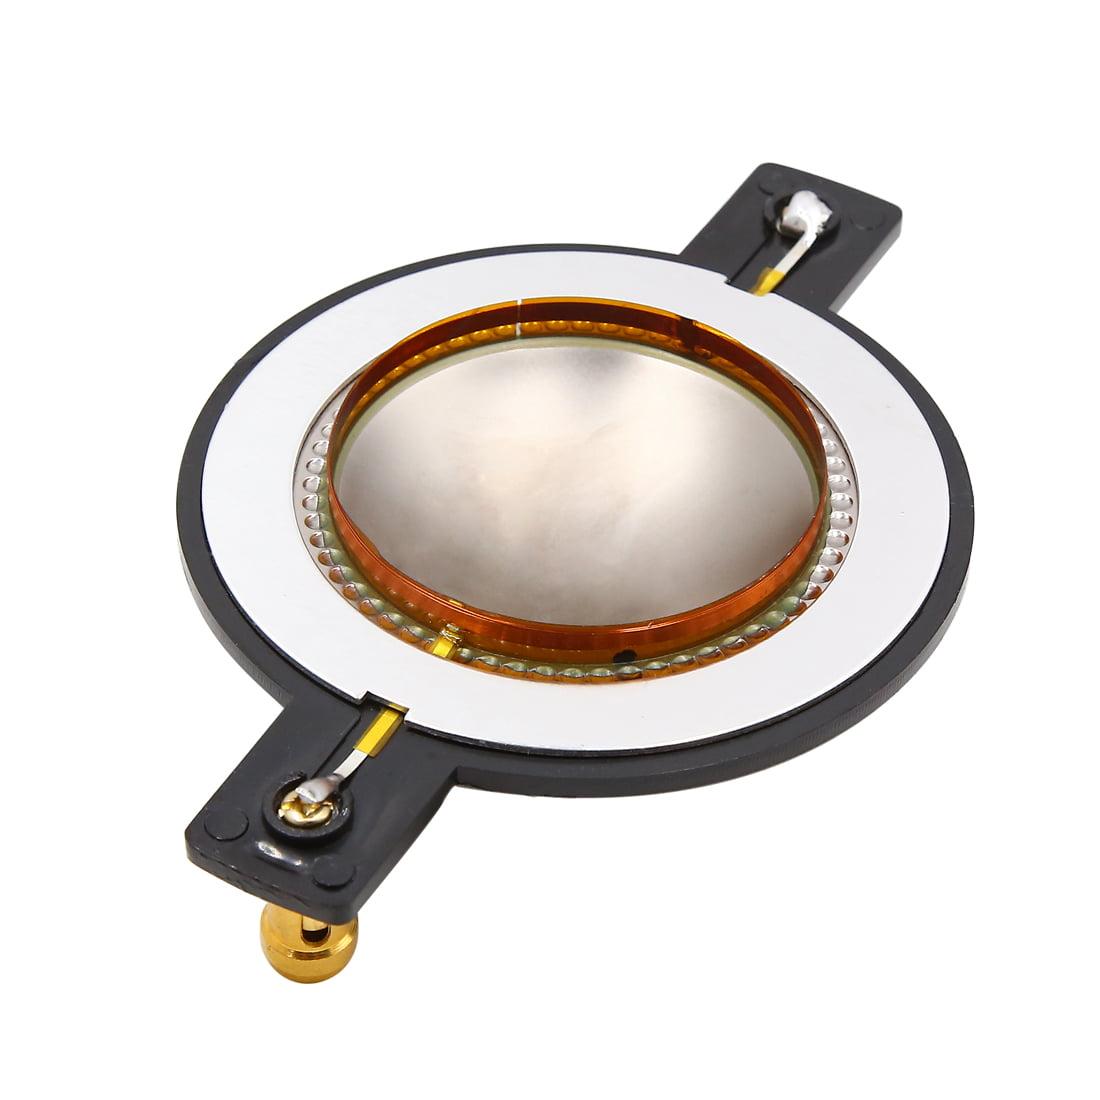 51.2mm Sound Speaker Diaphragm Car Voice Coil Replacement w Copper Pillar